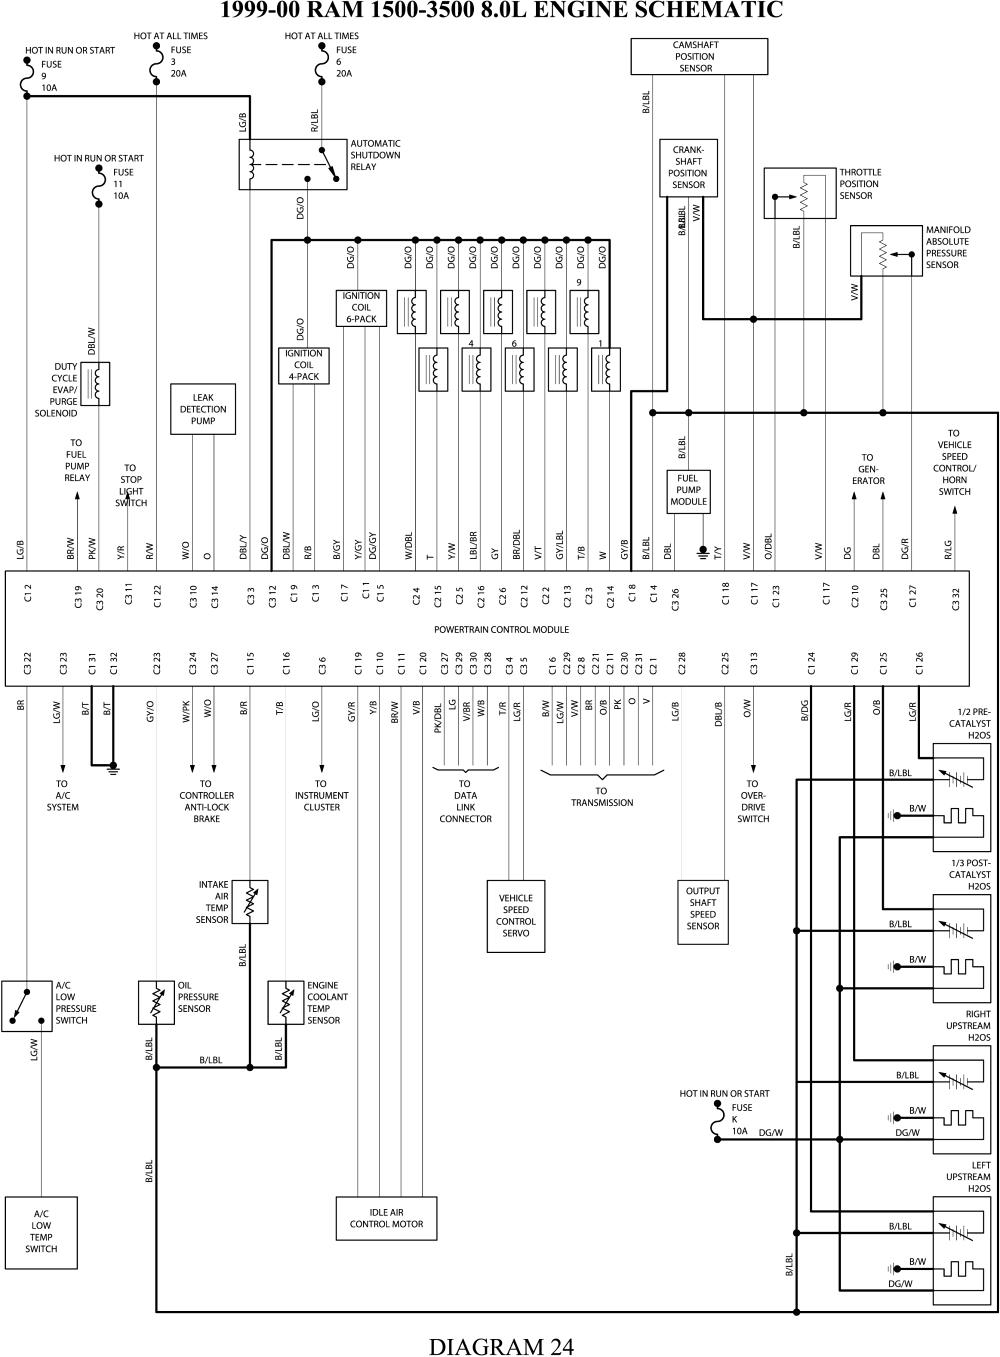 2002 Dodge Ram 1500 Wiring Diagram